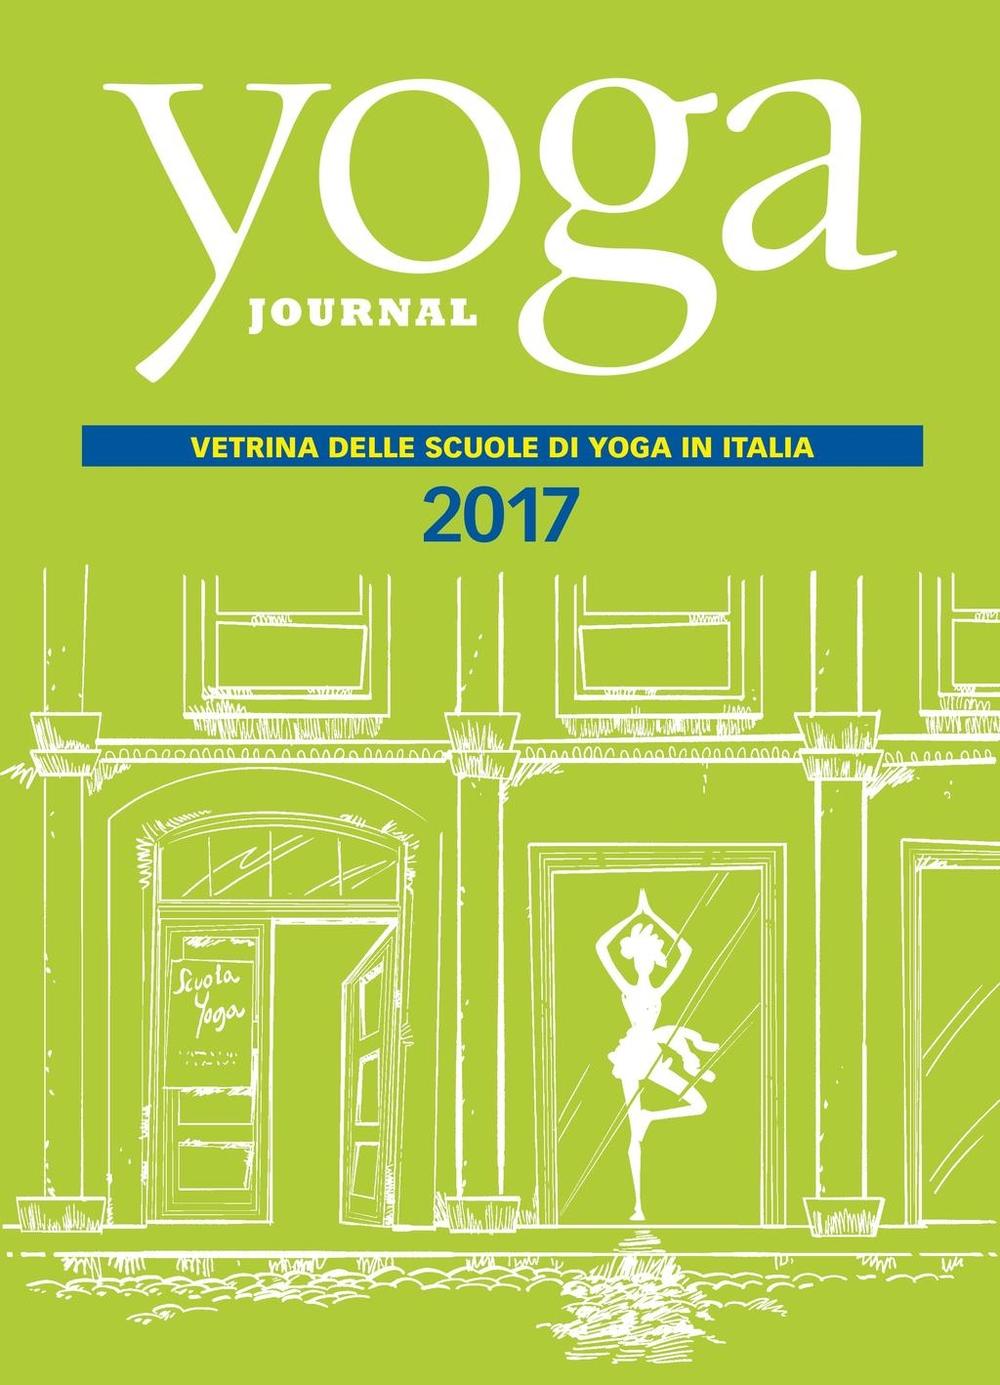 Yoga Journal Directory Scuole 2017